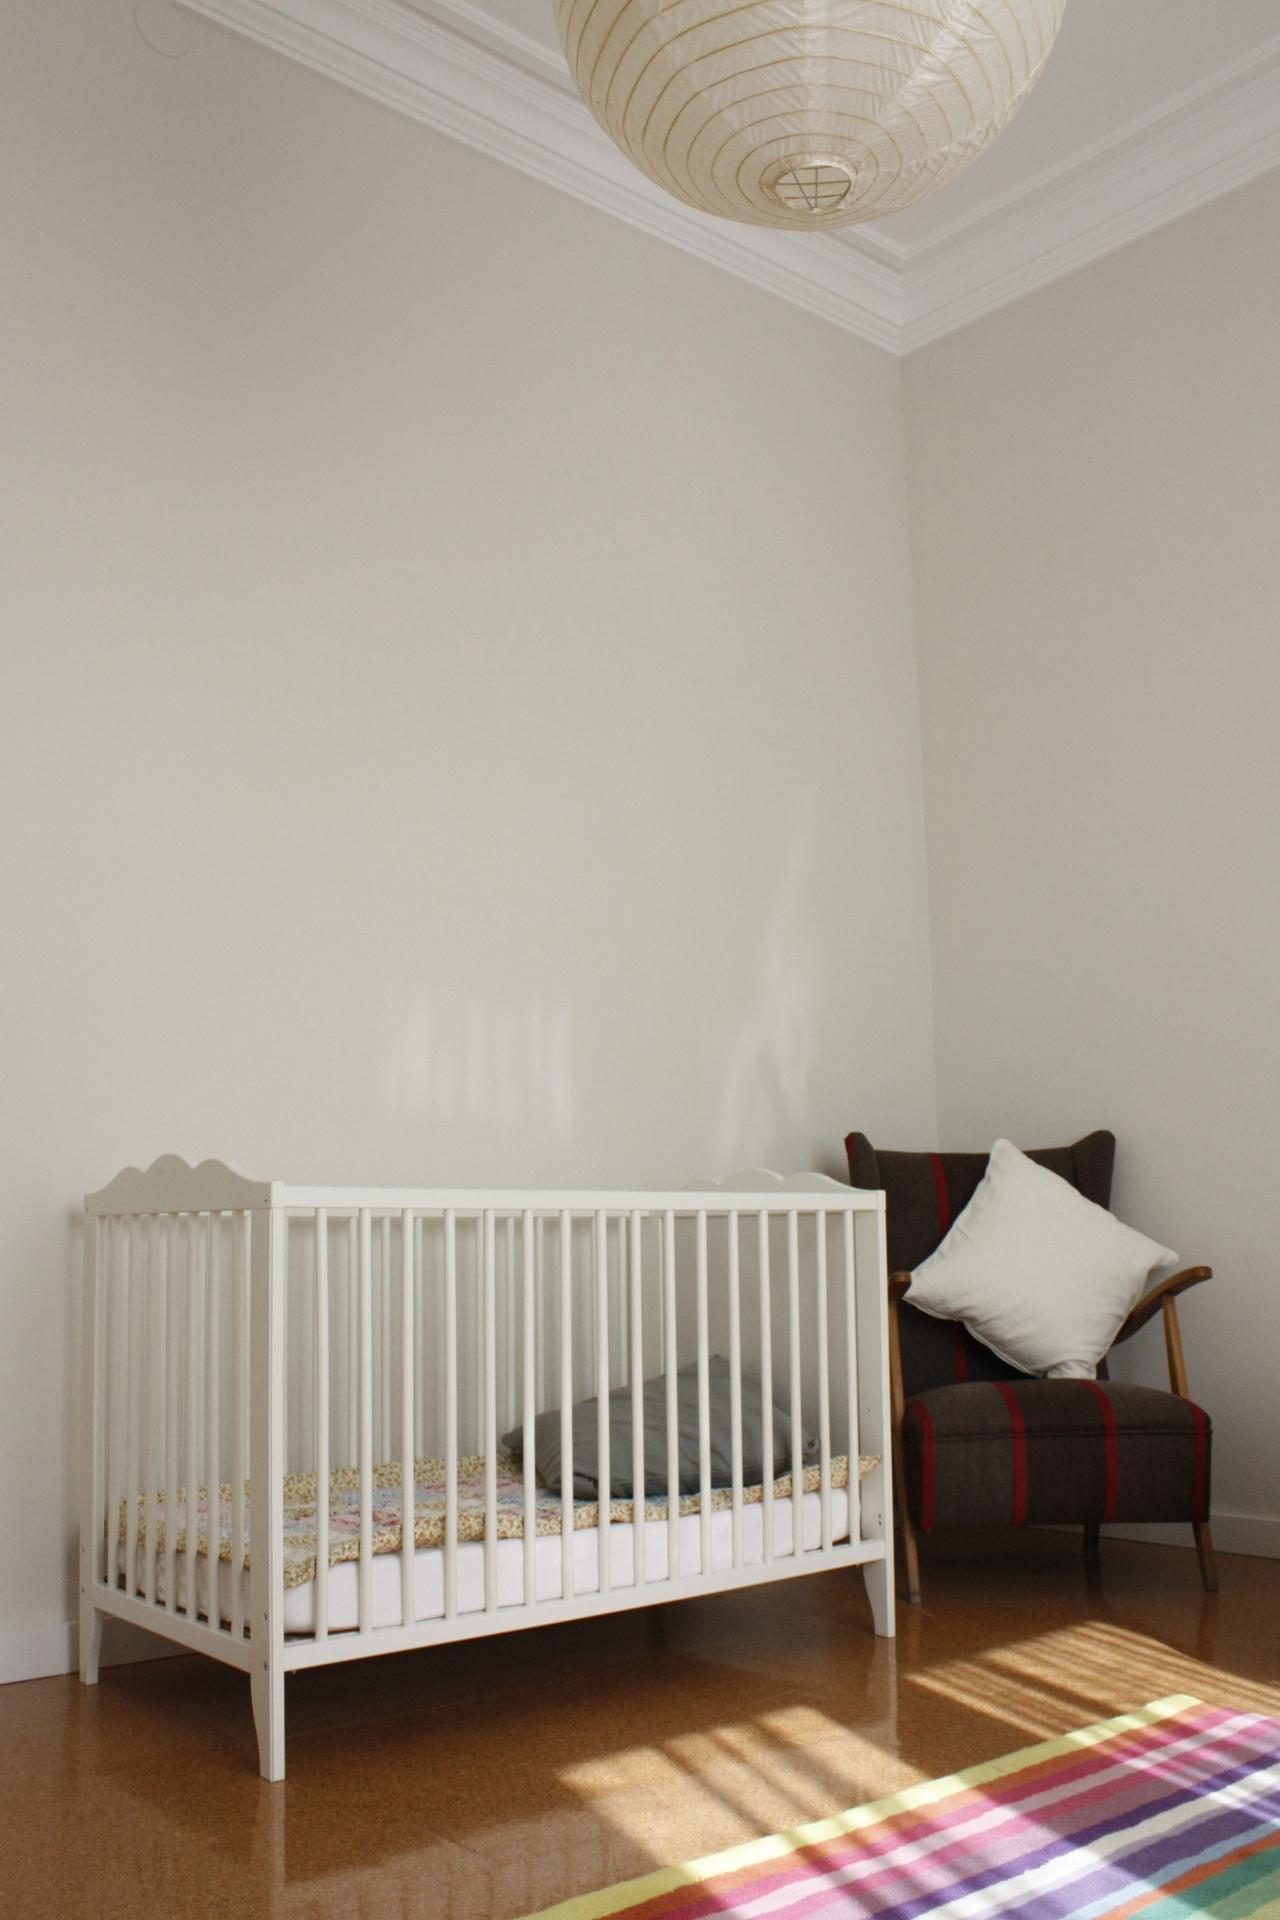 Kinderzimmer #sessel #kinderbett #babyzimmer #gestreiftersessel ©Victoria  Aragonés / Innenarhitektur